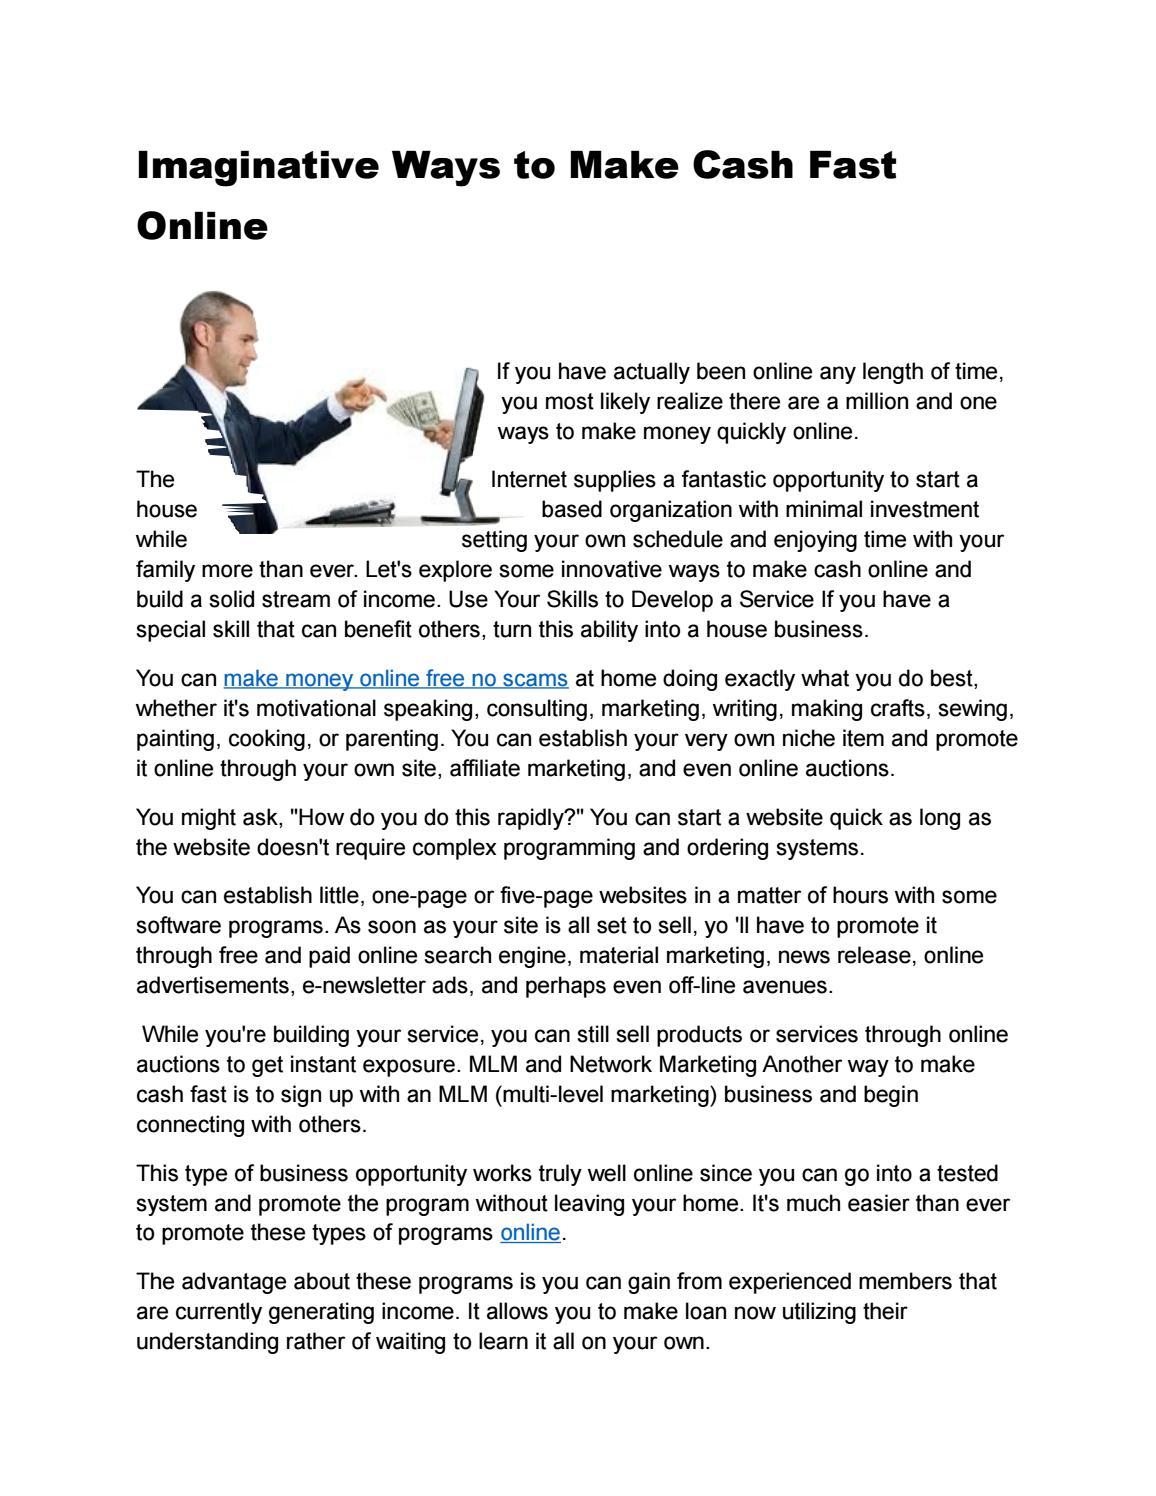 Earn money online free by makemoneyonlineforfree01 - issuu